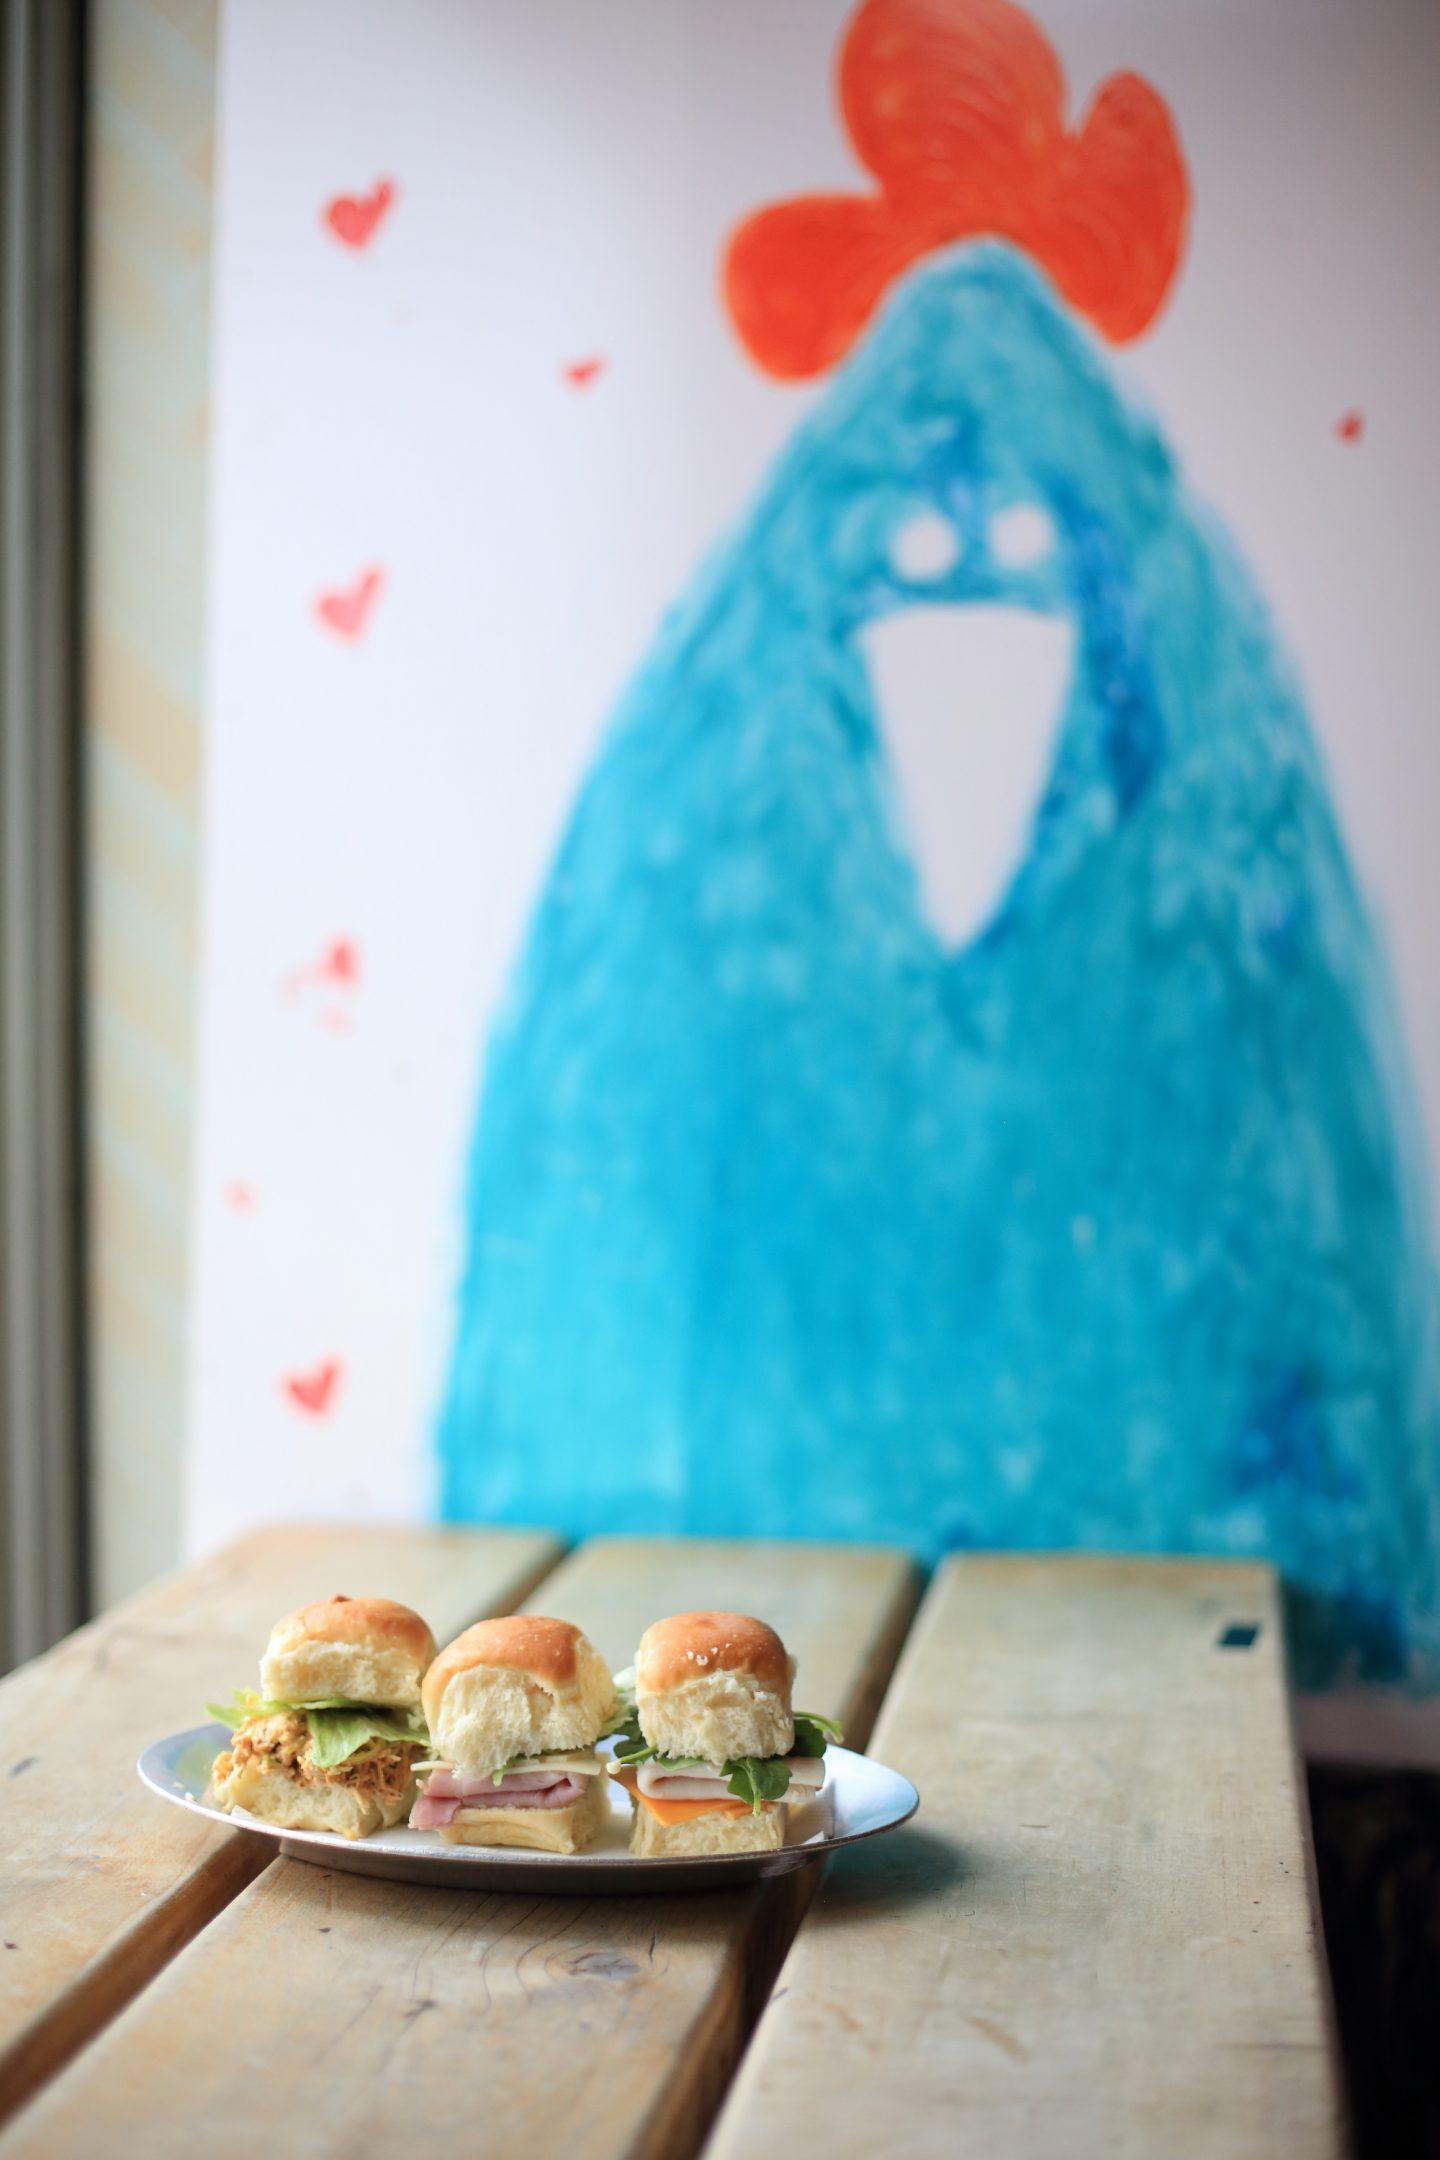 challah sandwiches